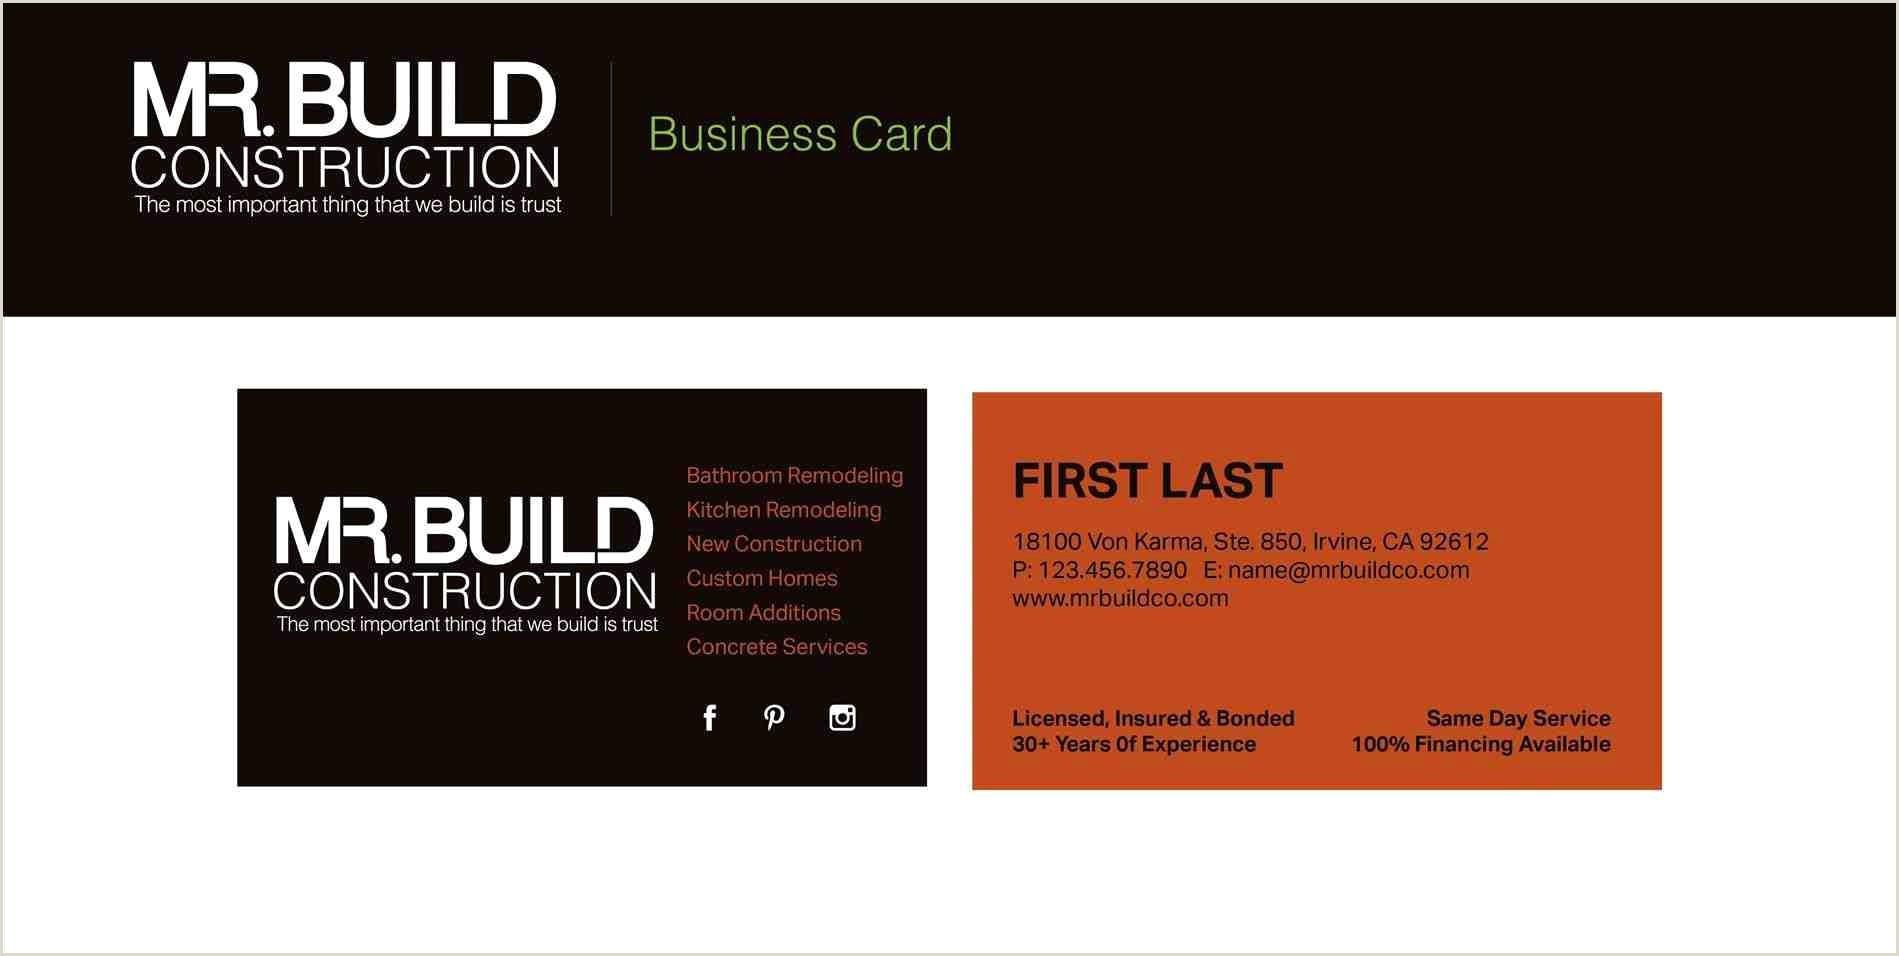 Business Card Title Examples 14 Popular Hardwood Flooring Business Card Template